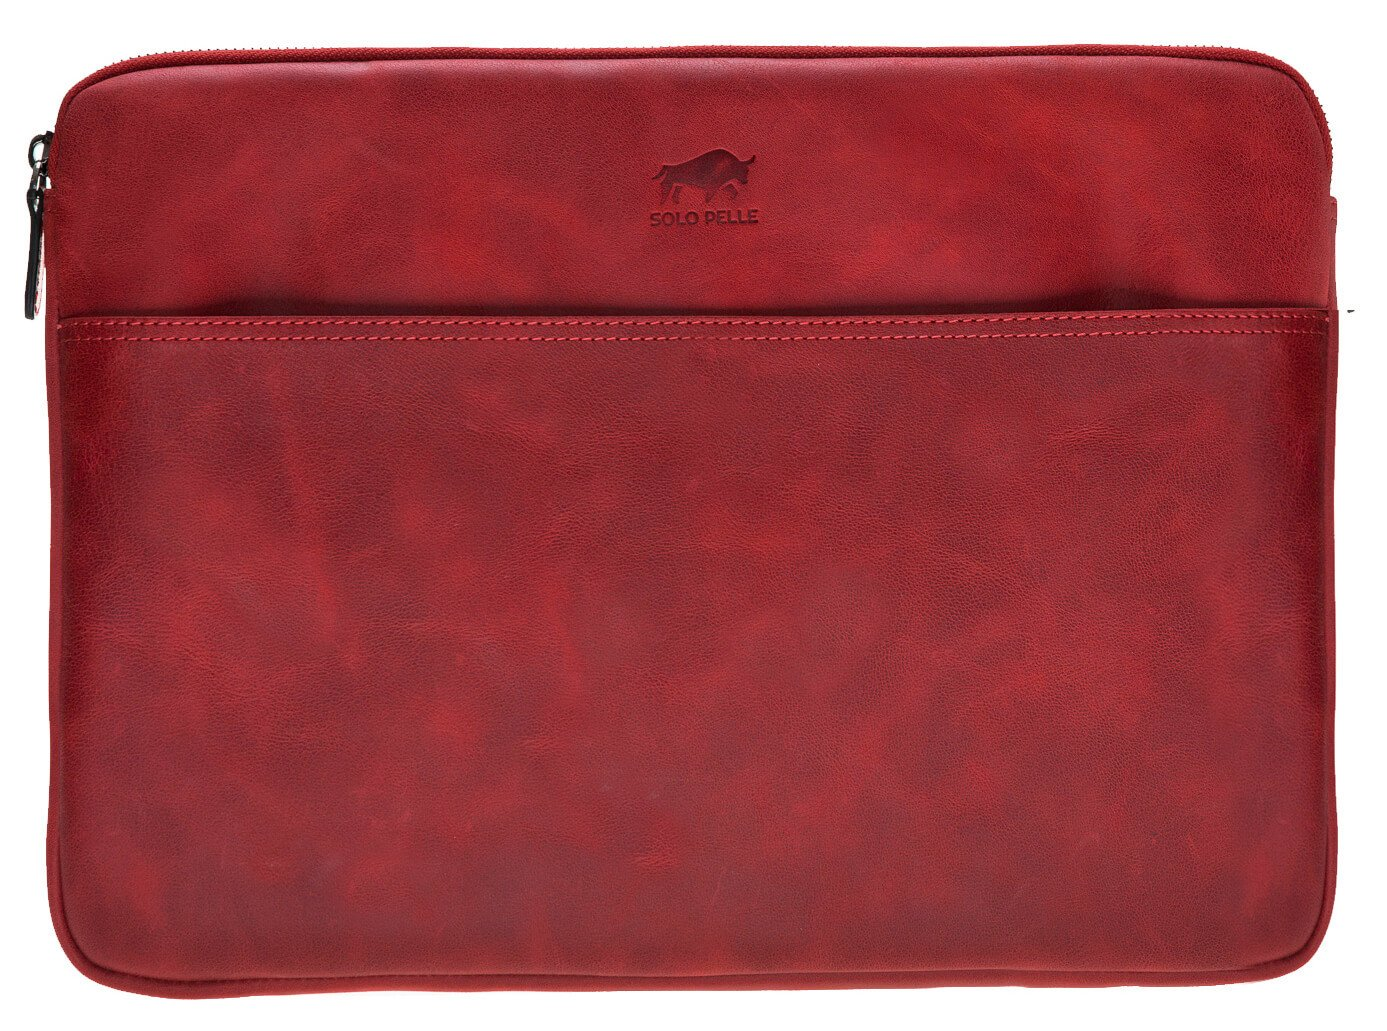 Solo Pelle Ledertasche für das Apple MacBook Pro 15 Zoll Lederhülle Case Hülle Awenta Tasche aus echtem Leder Rot Burned